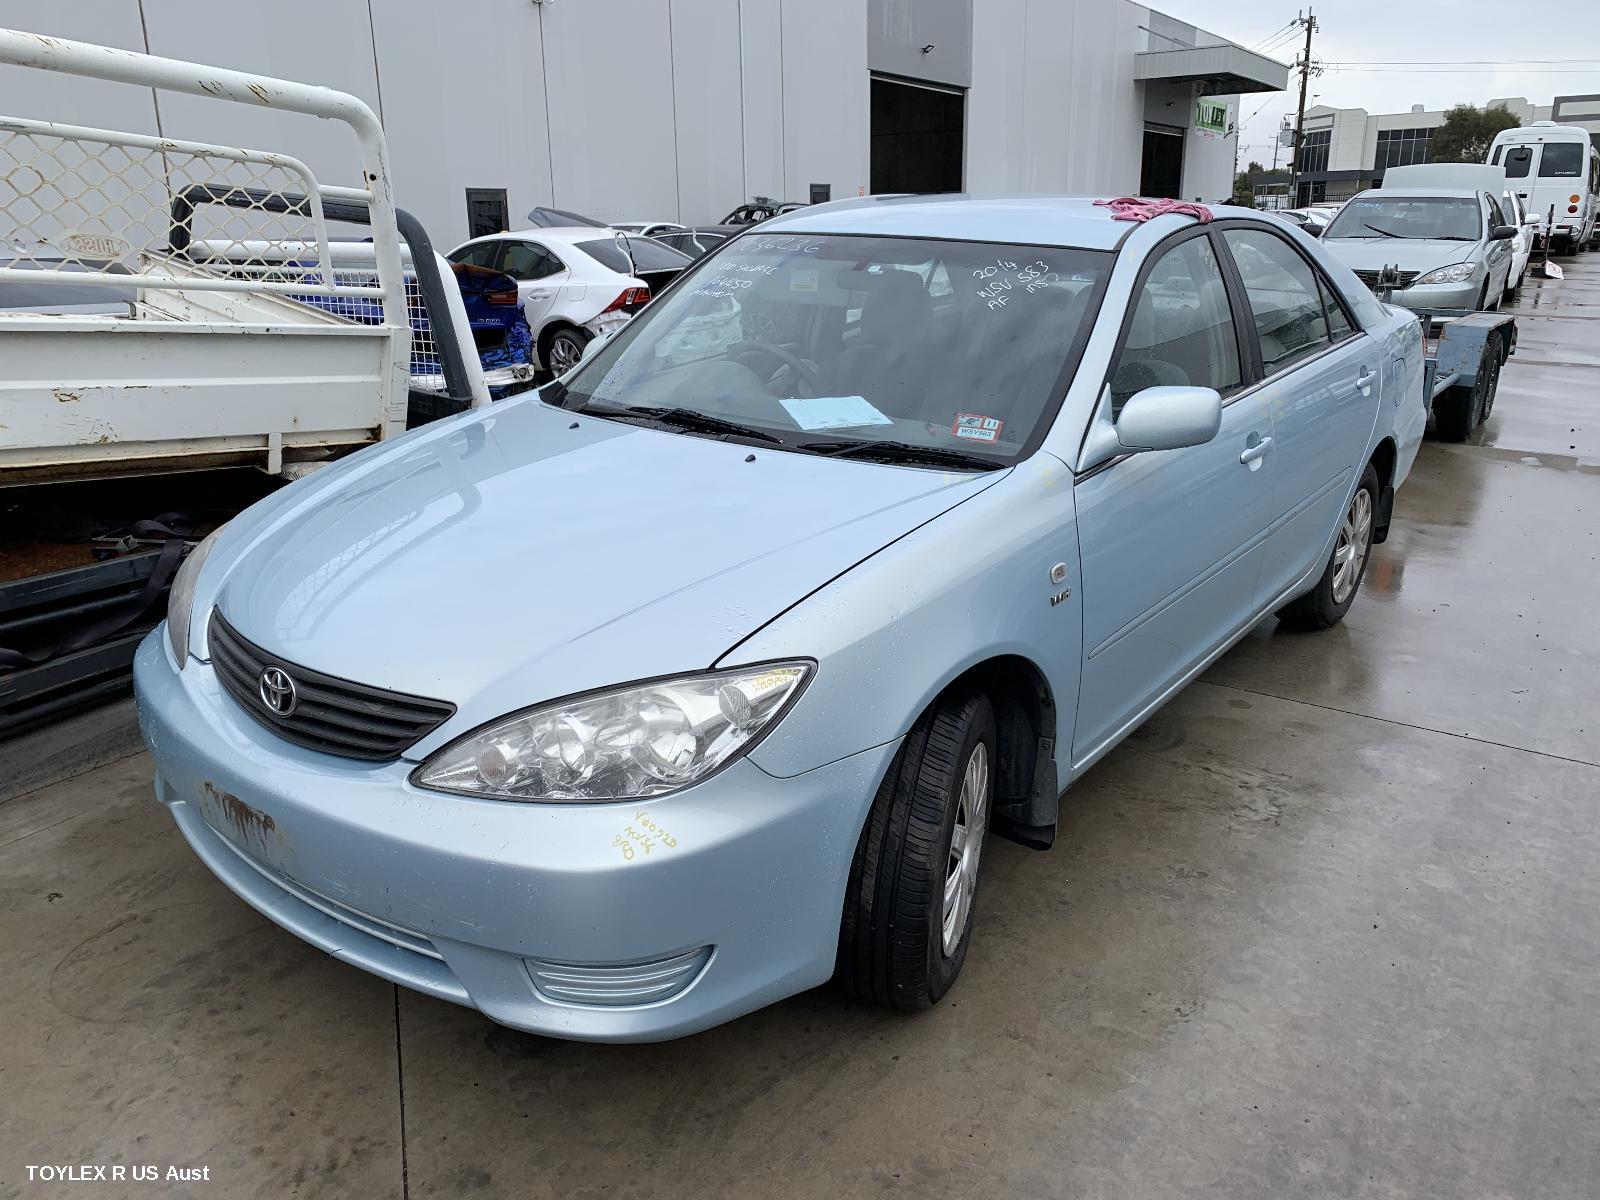 Toyota CAMRY ALTISE ACV36R 2AZ-FE 2.4L Engine Automatic FWD Transmission 08/02 - 05/06